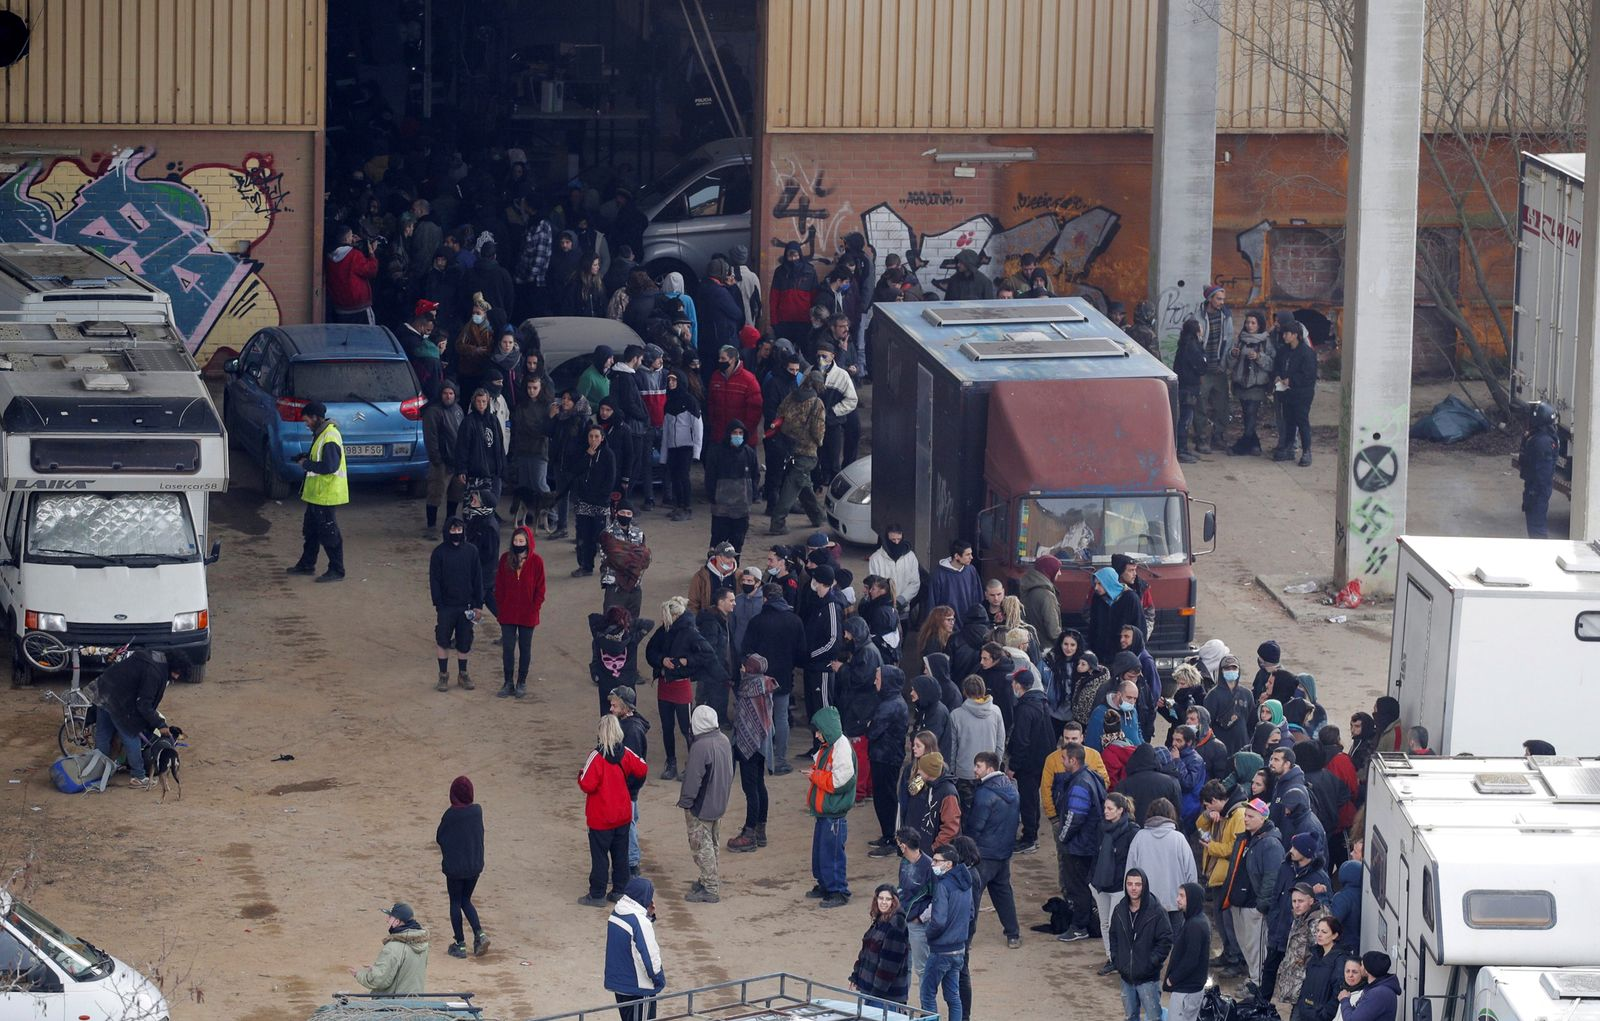 Illegal rave starting on 31 December is evicted on 02 January, Llinars Del Valles Barcelona, Spain - 02 Jan 2021